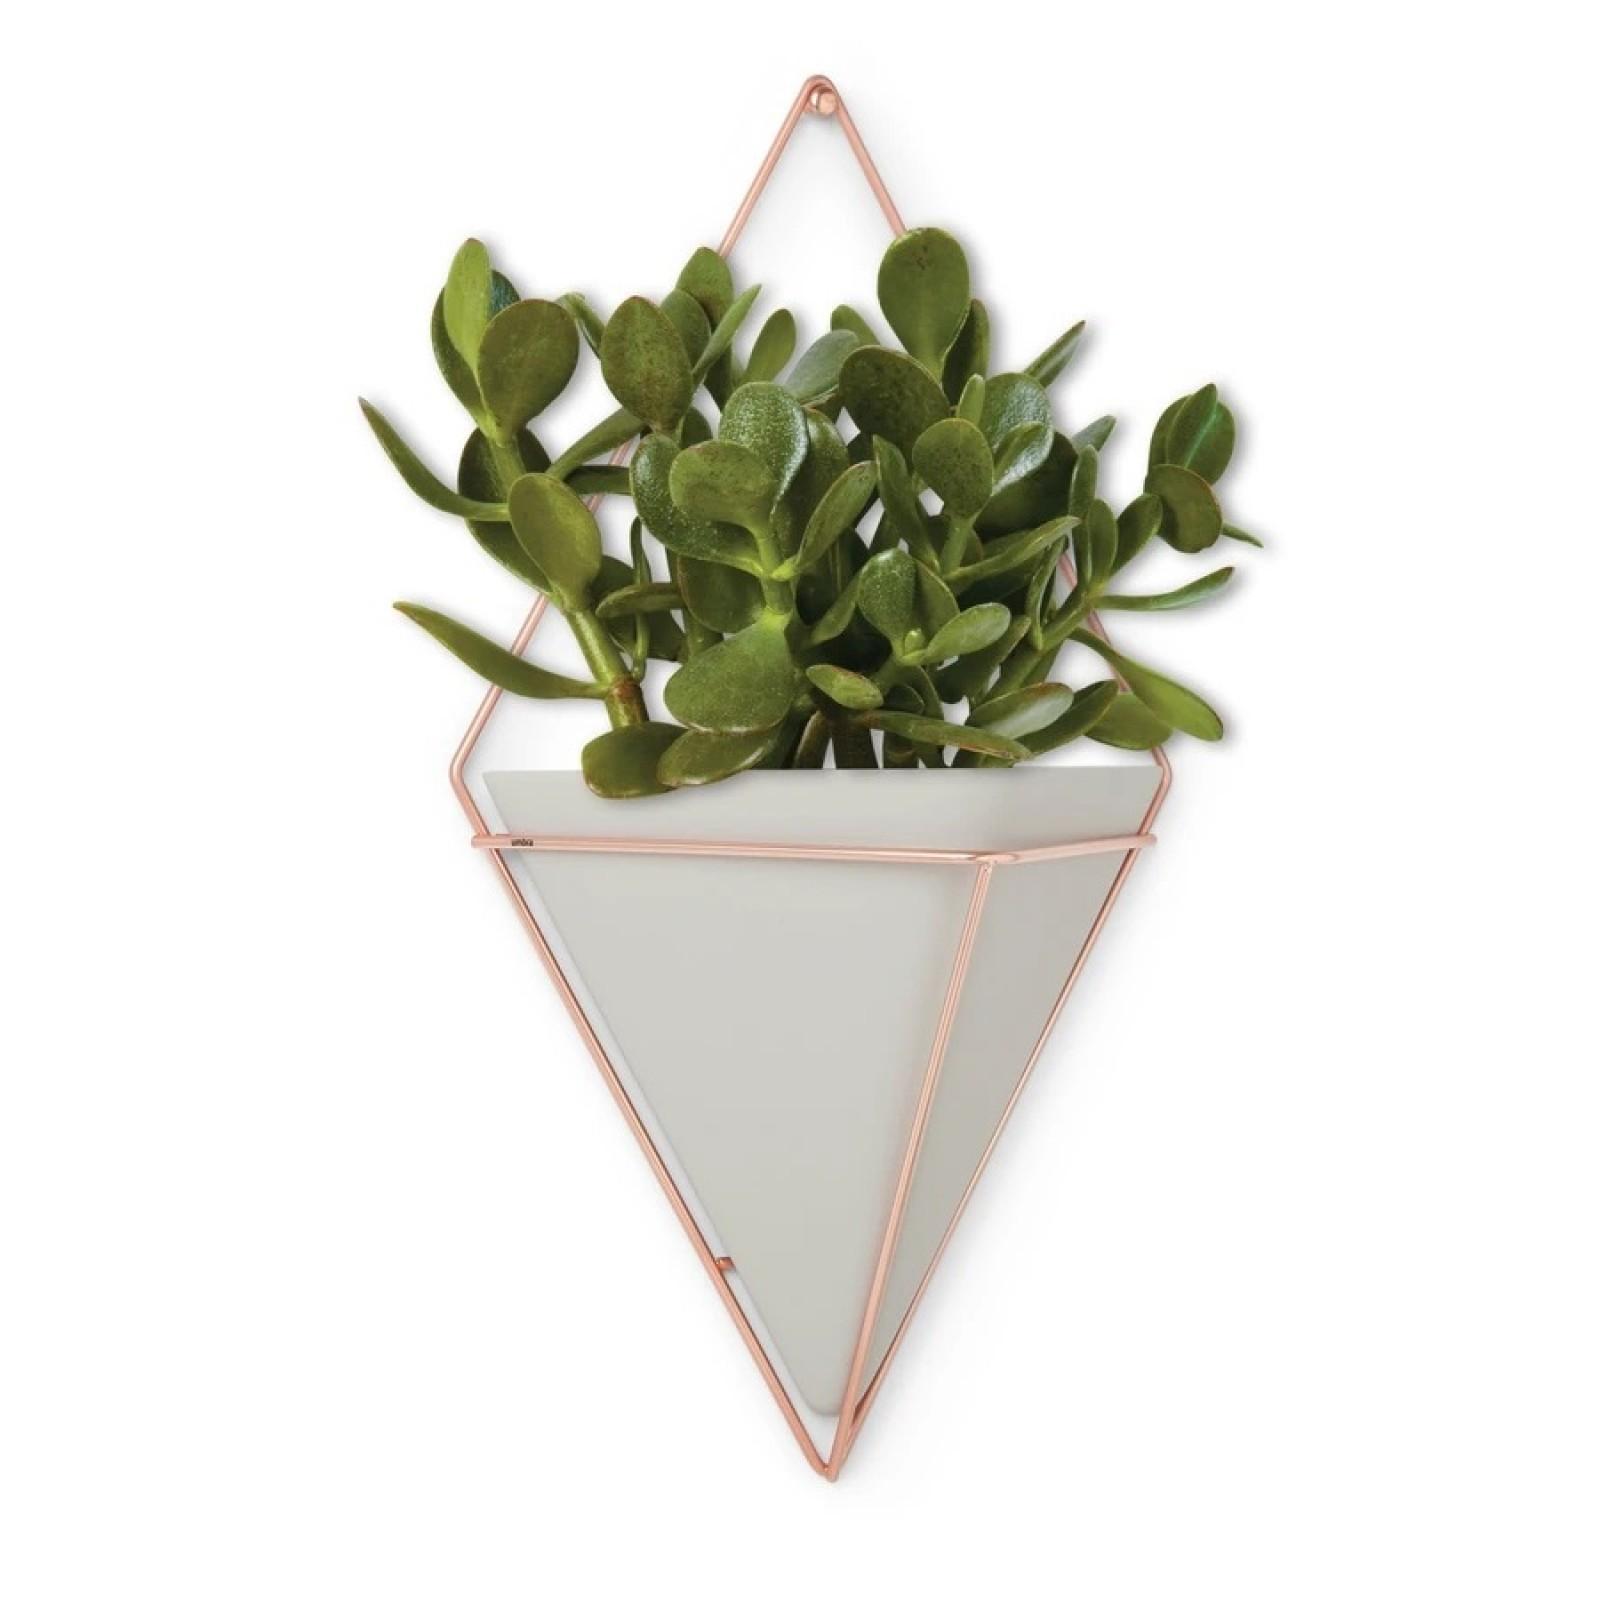 Trigg Large Hanging Wall Planter & Vase (Concrete / Copper) - Umbra